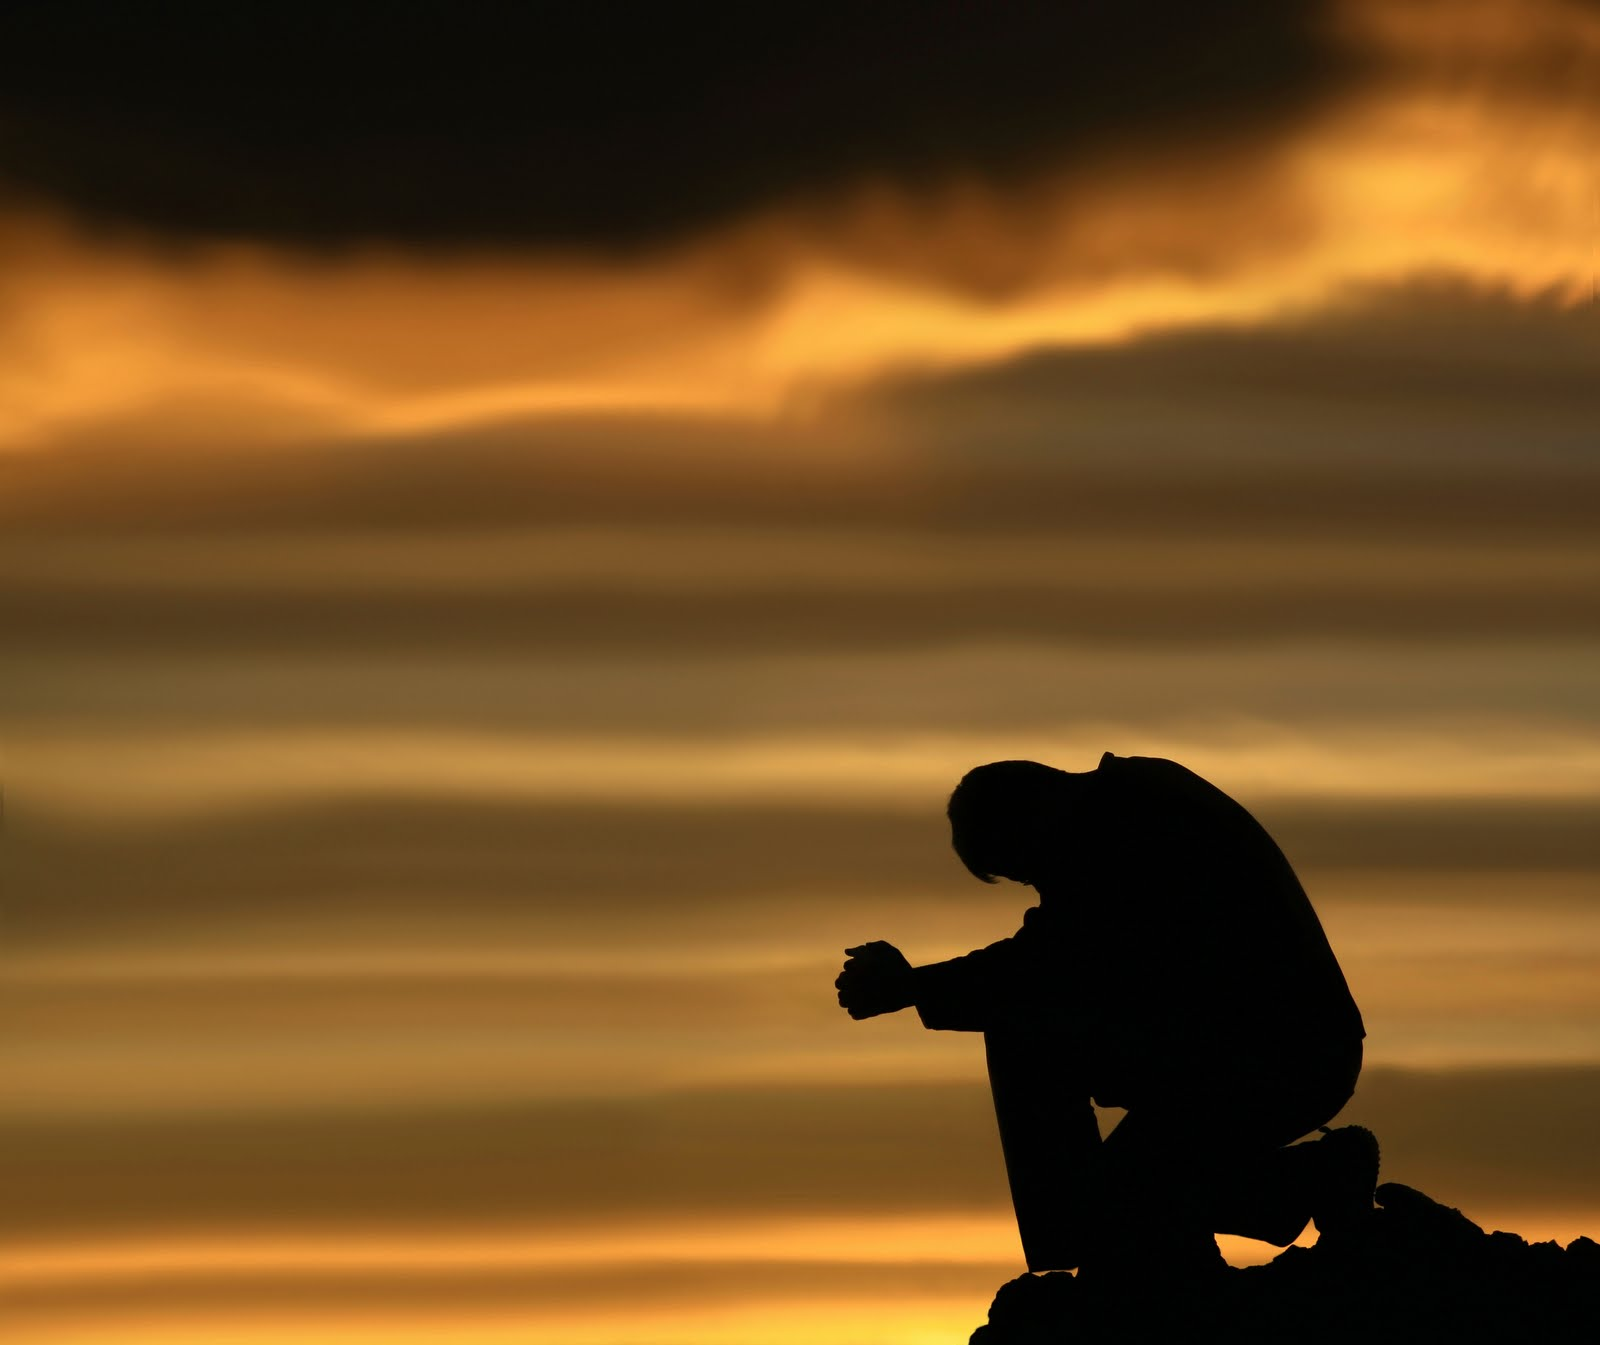 Gambar-gambar+orang+sedih+sakit+dan+patah+hati+Lengkap+2.jpg